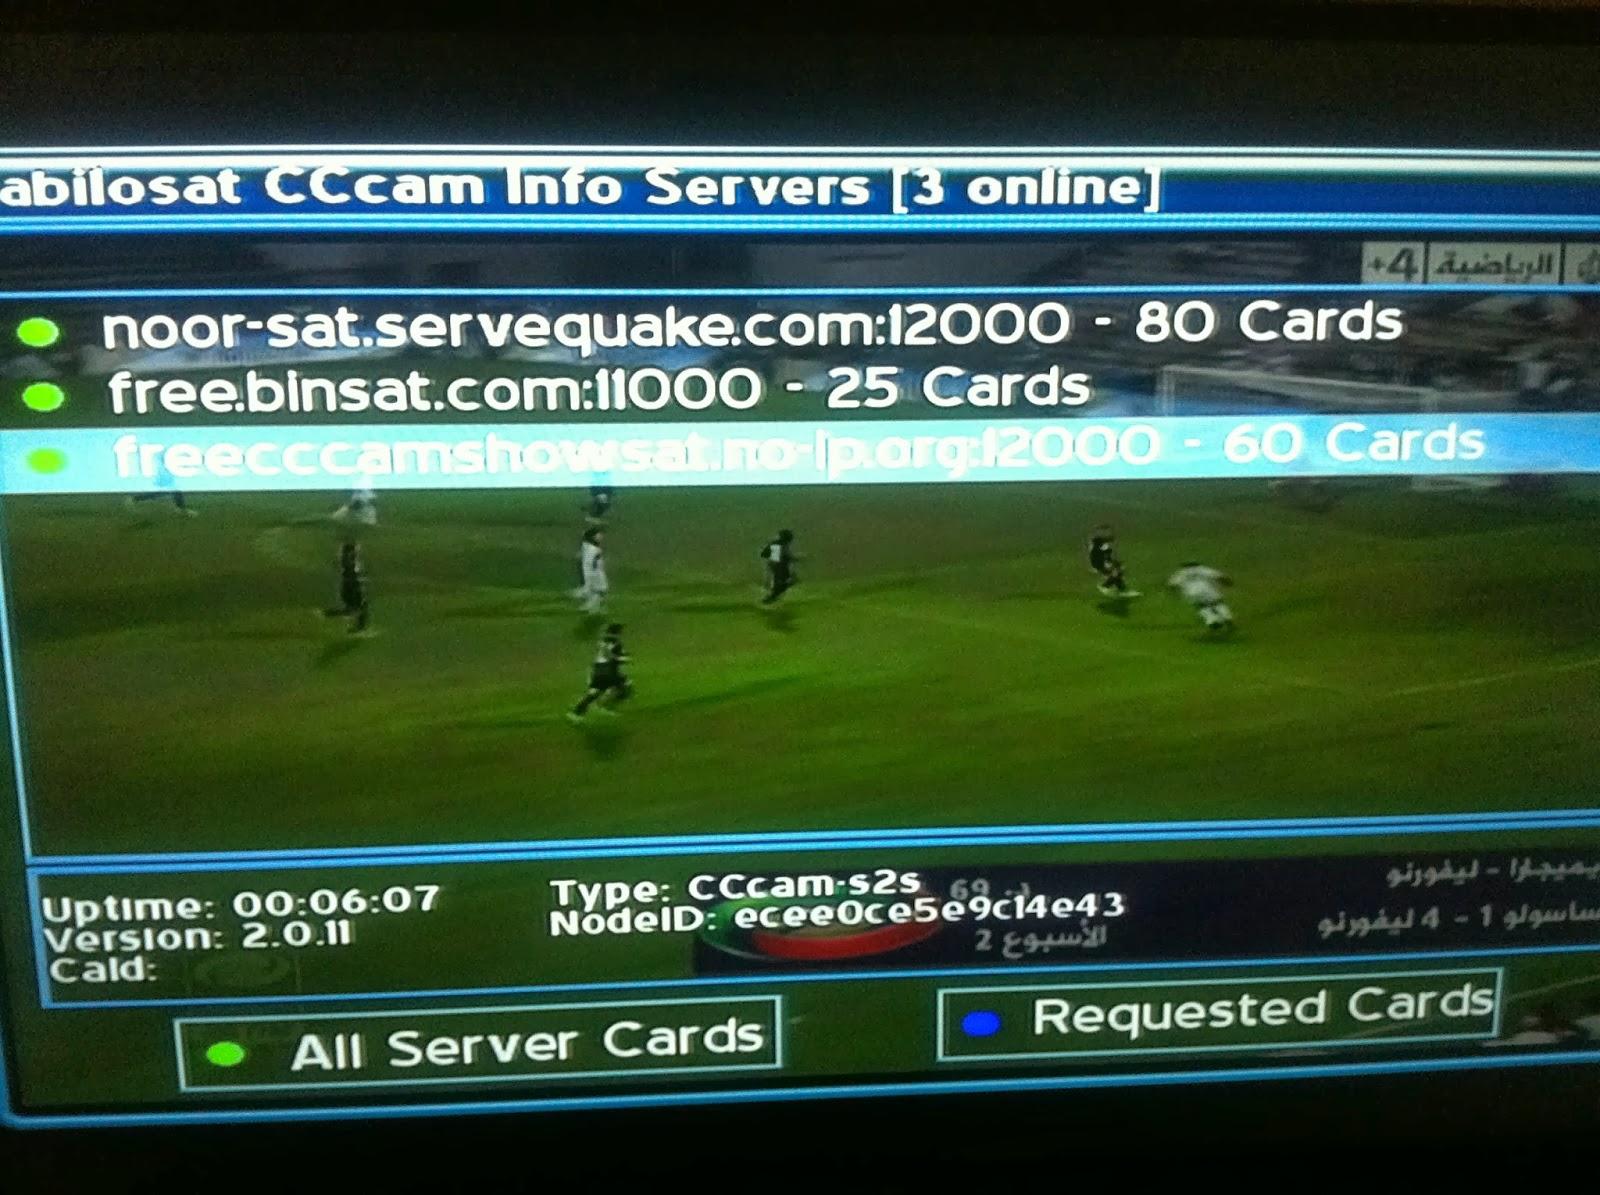 Cccam servers free : caralibro ga